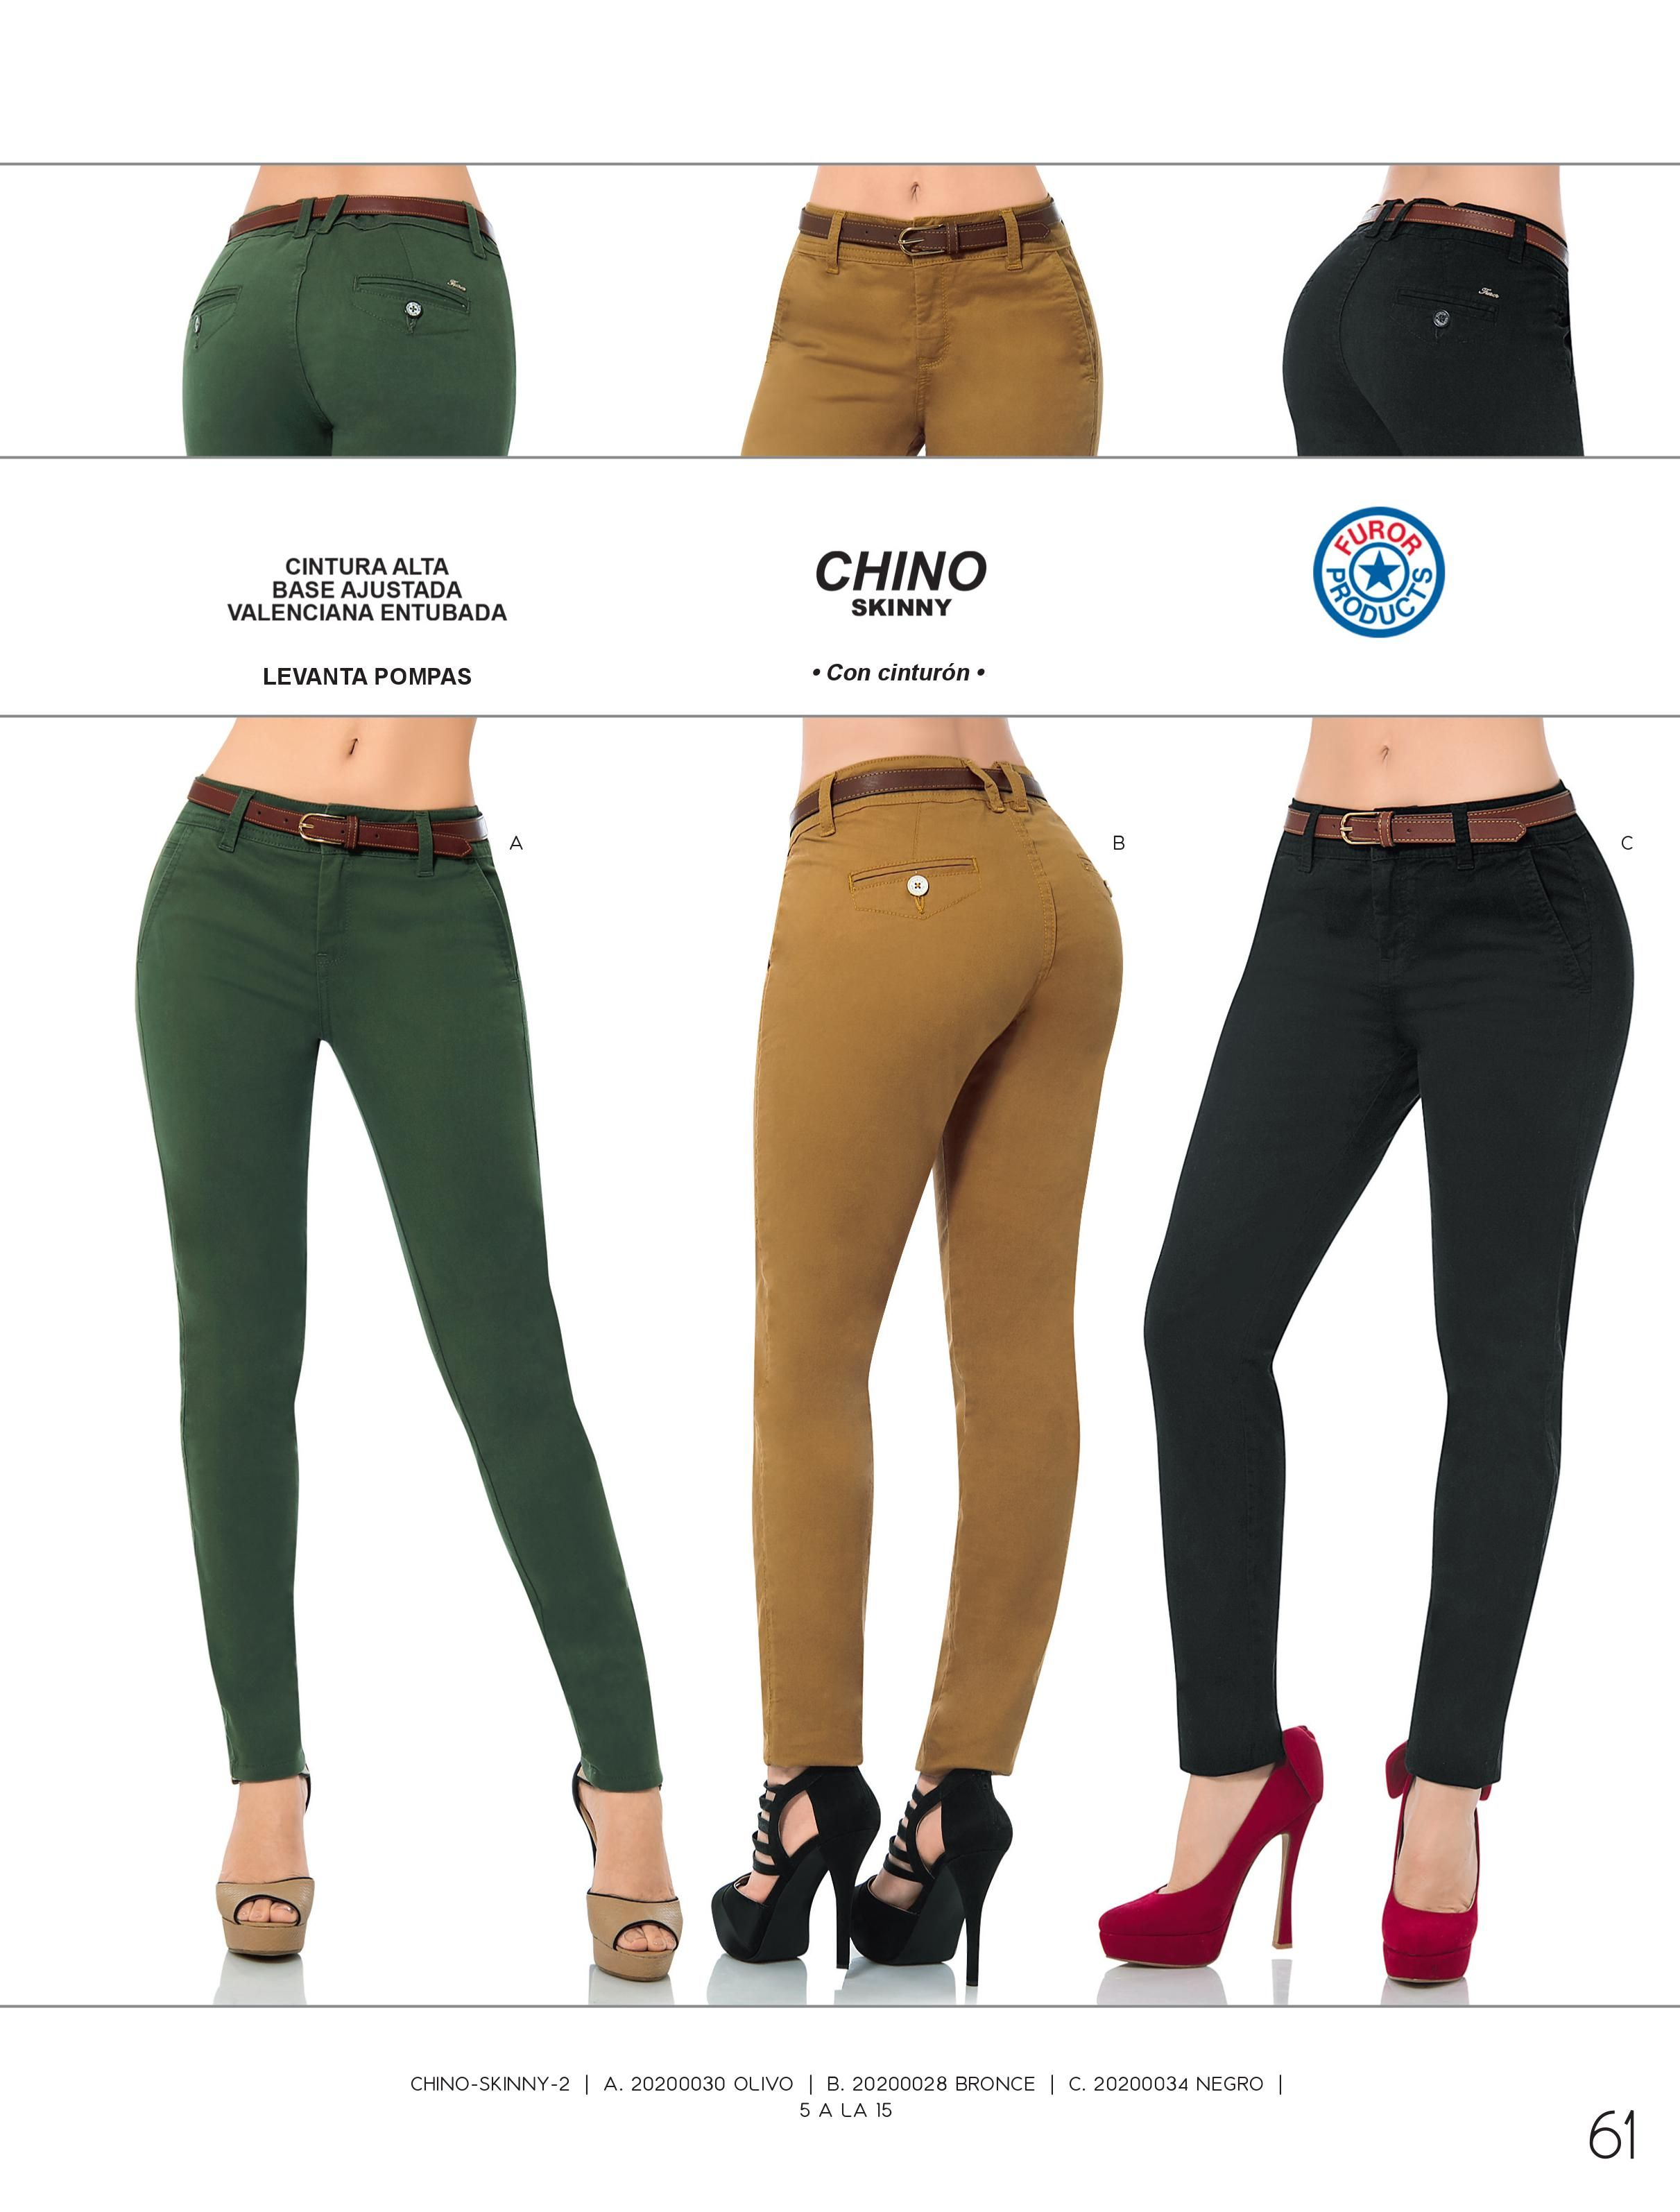 Pantalones Dama Furor Colores Ropa Outfits Damas